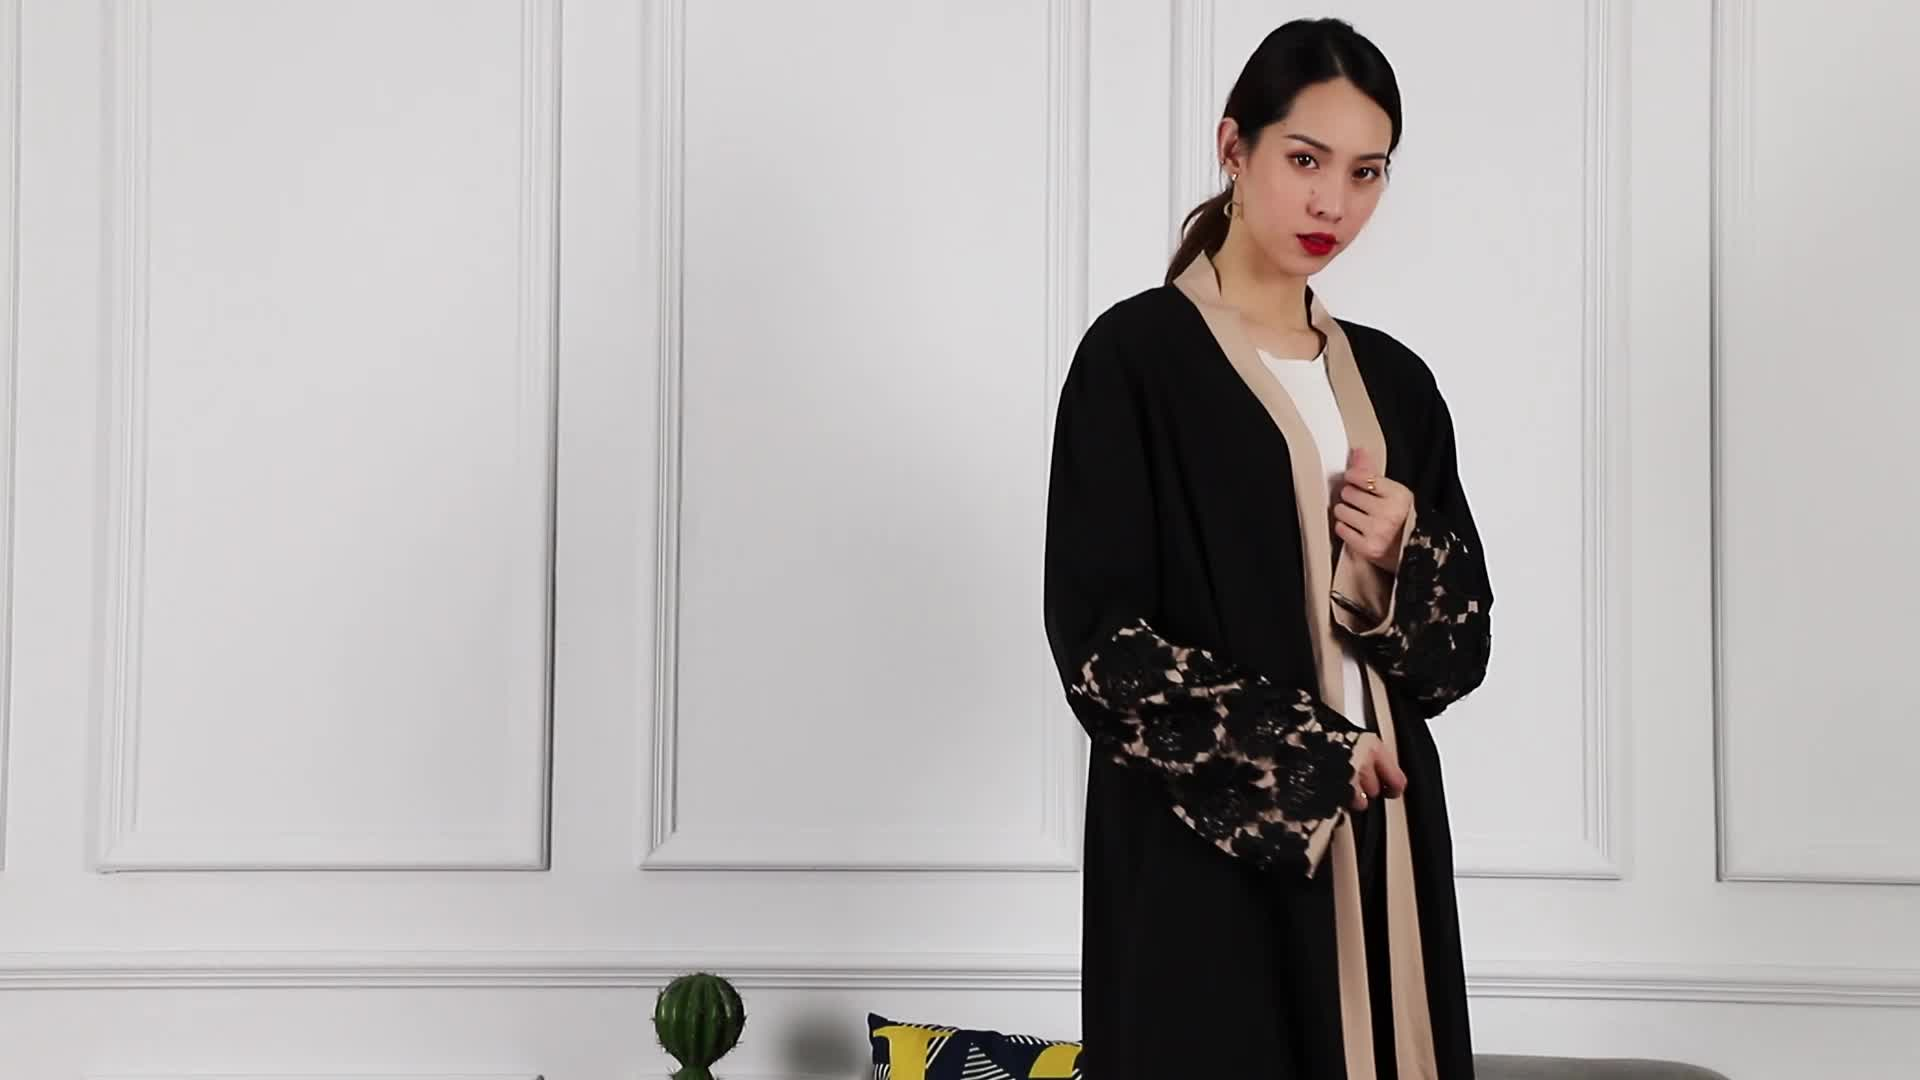 1502# 2019 Latest New Designs Embroidery Cardigan Islamic Clothing Fashion Front Open Kimono Arabic Style Dubai Muslim Abaya